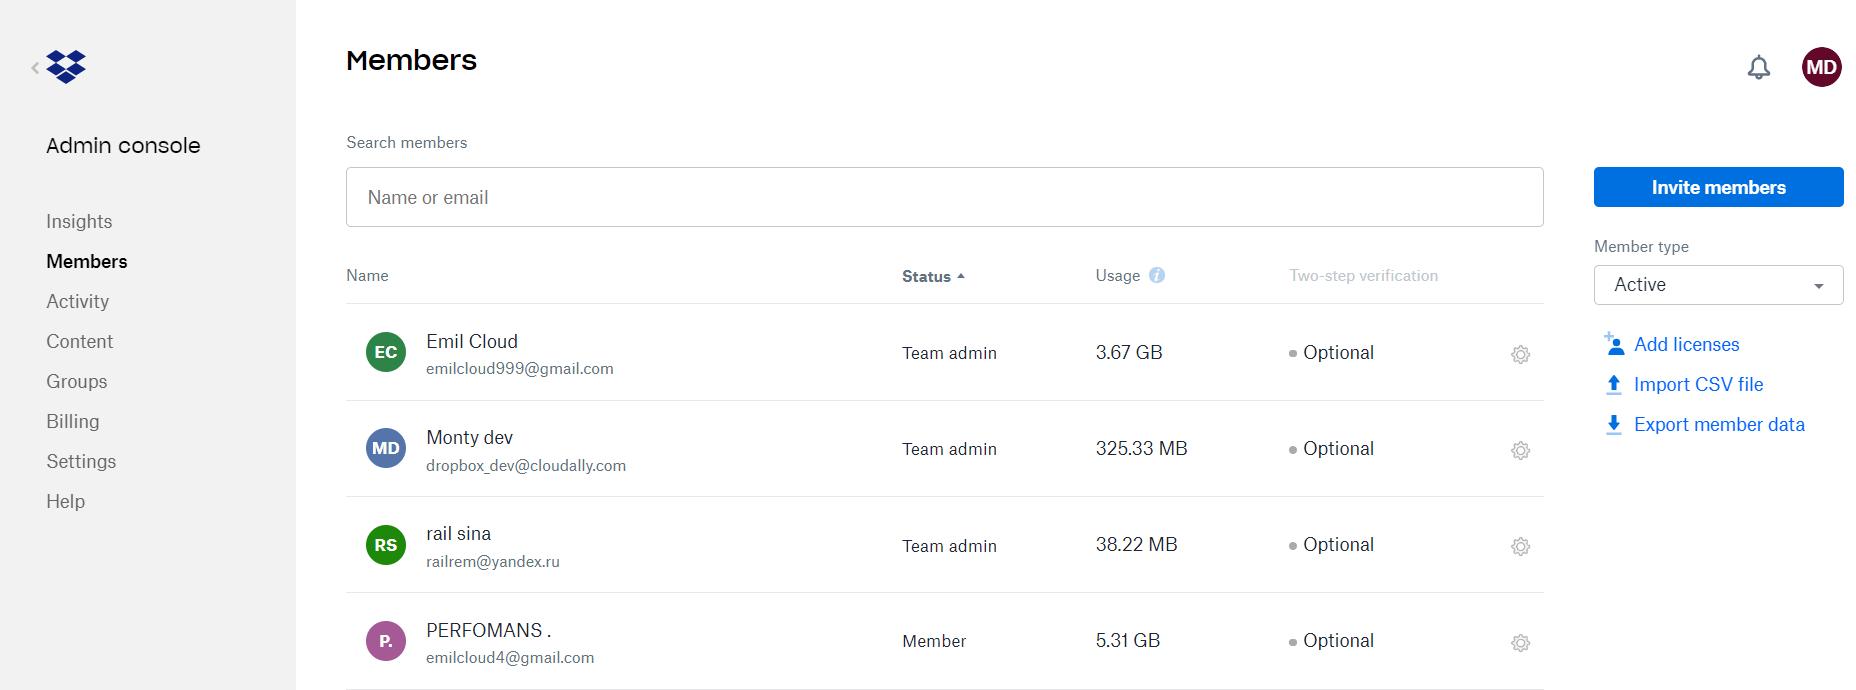 Members_-_Dropbox_-_Google_Chrome_2020-07-03_11.57.png